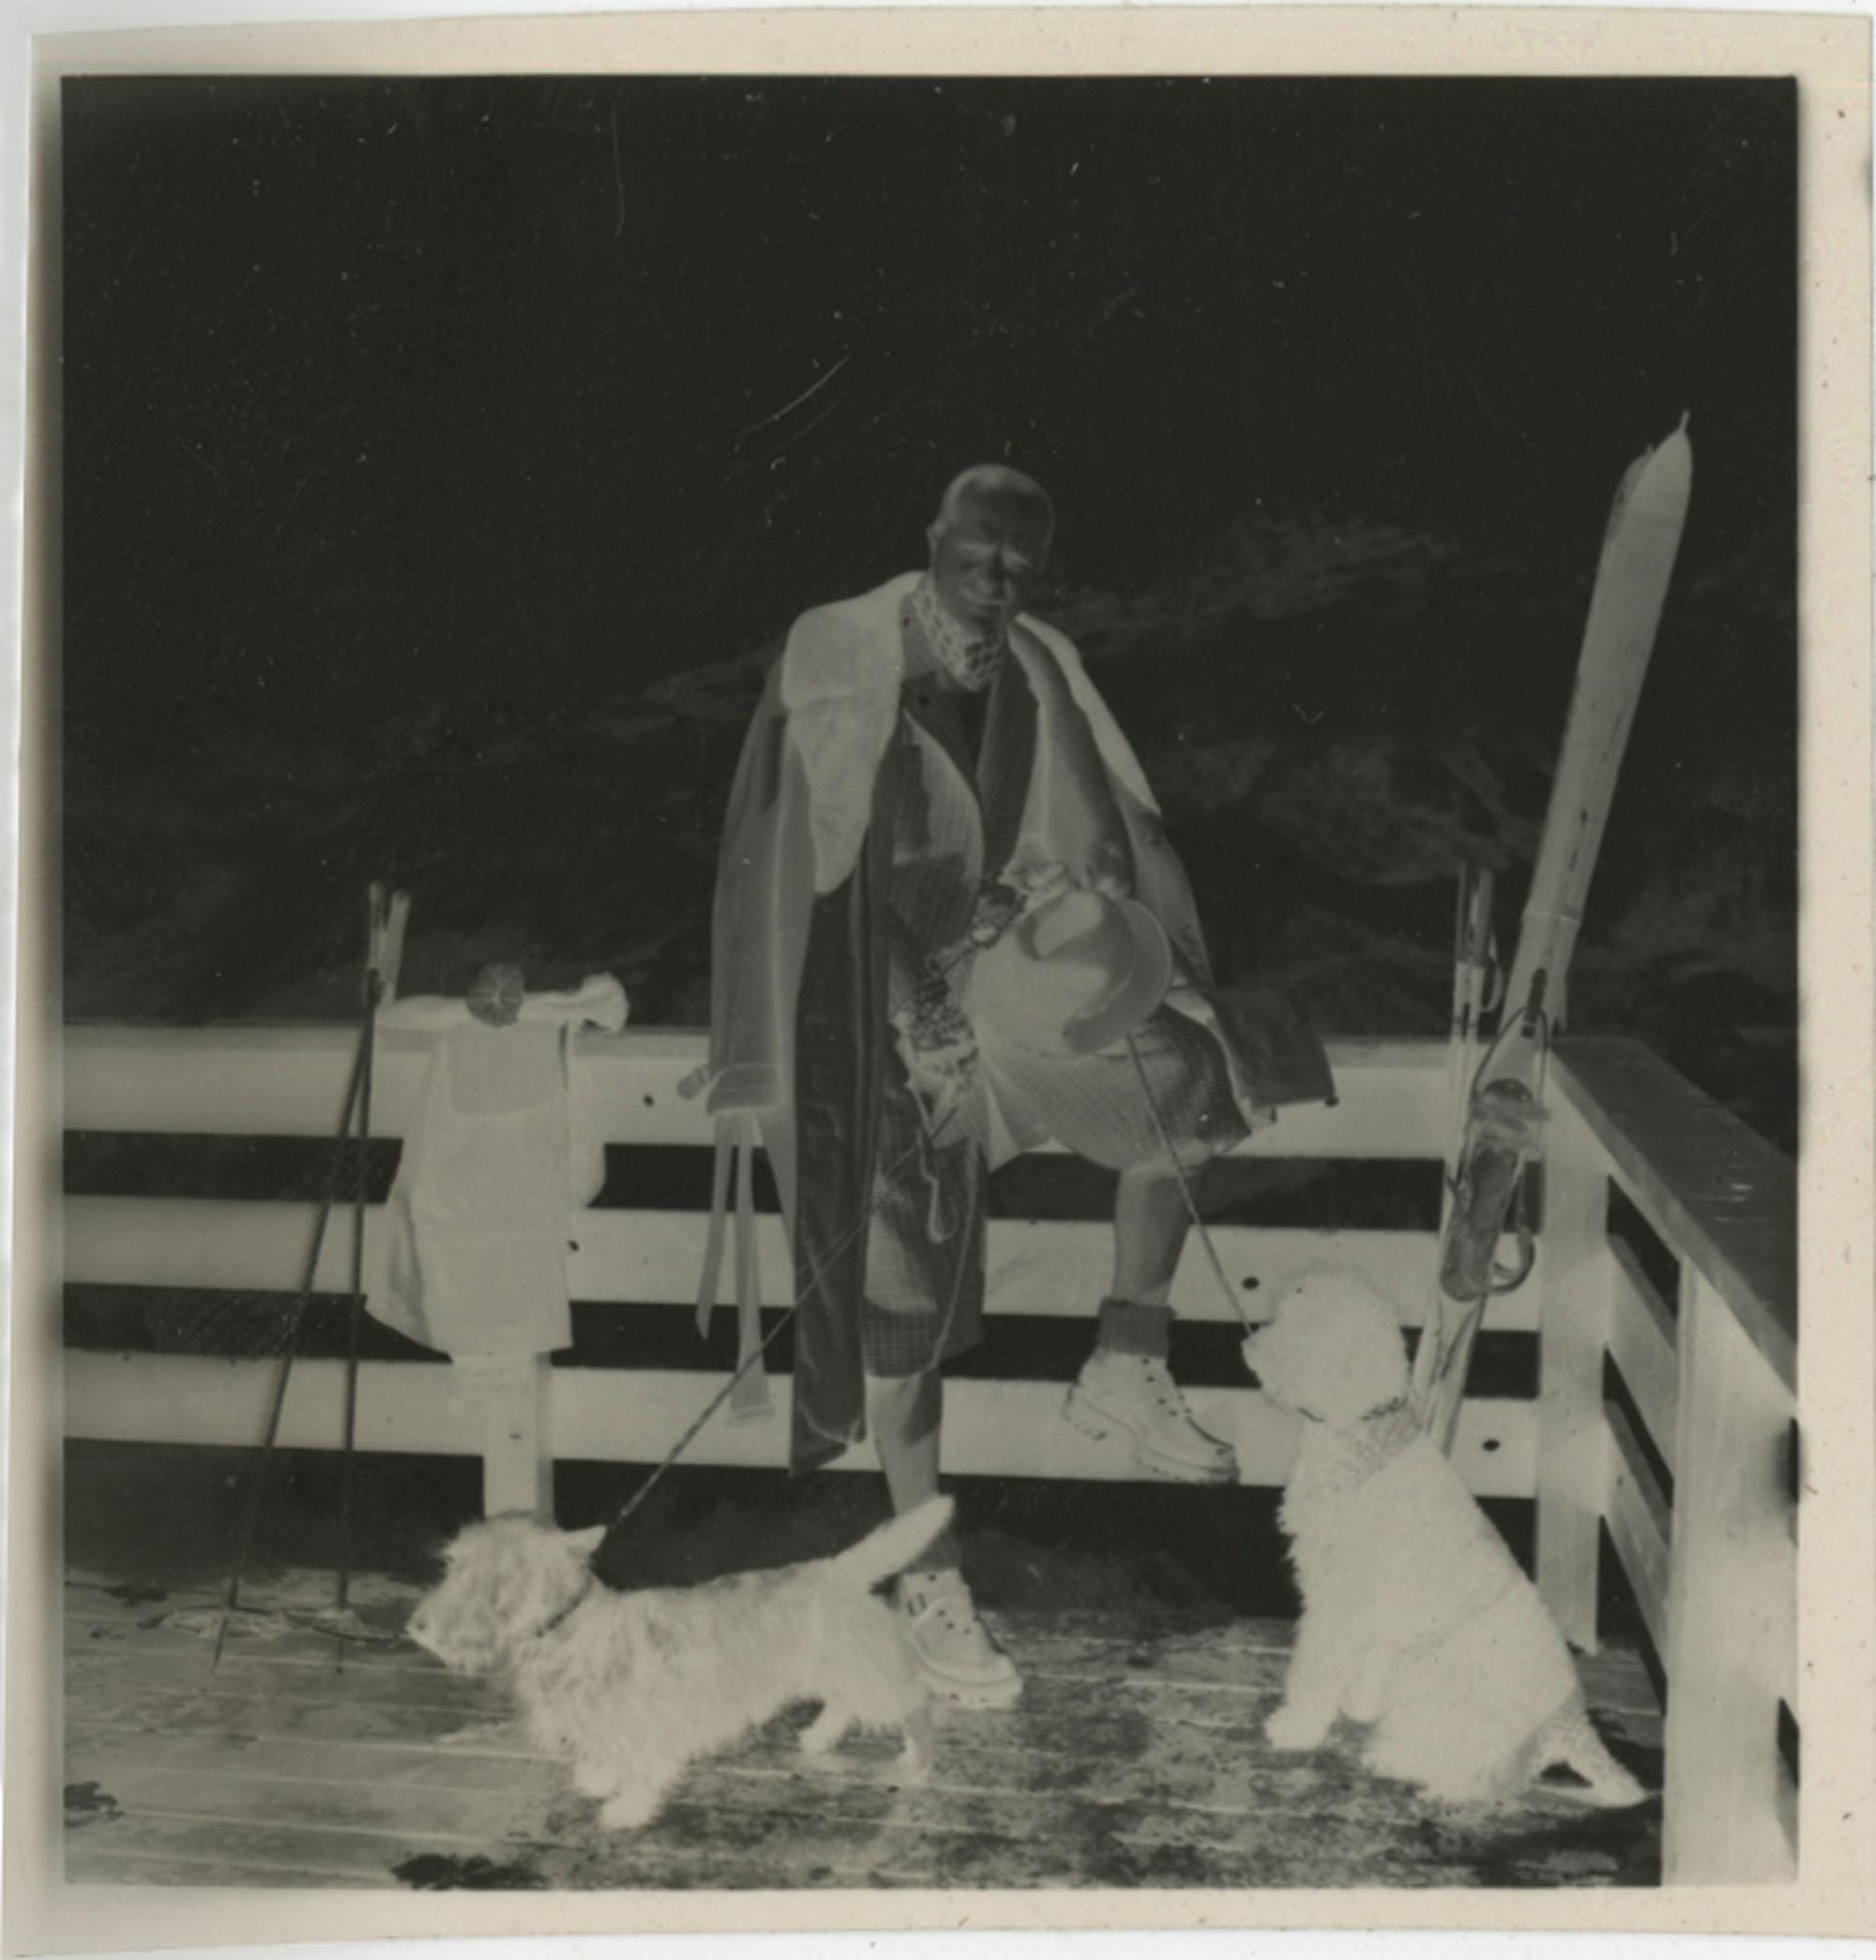 Flip book containing photographs of Mario Pansa